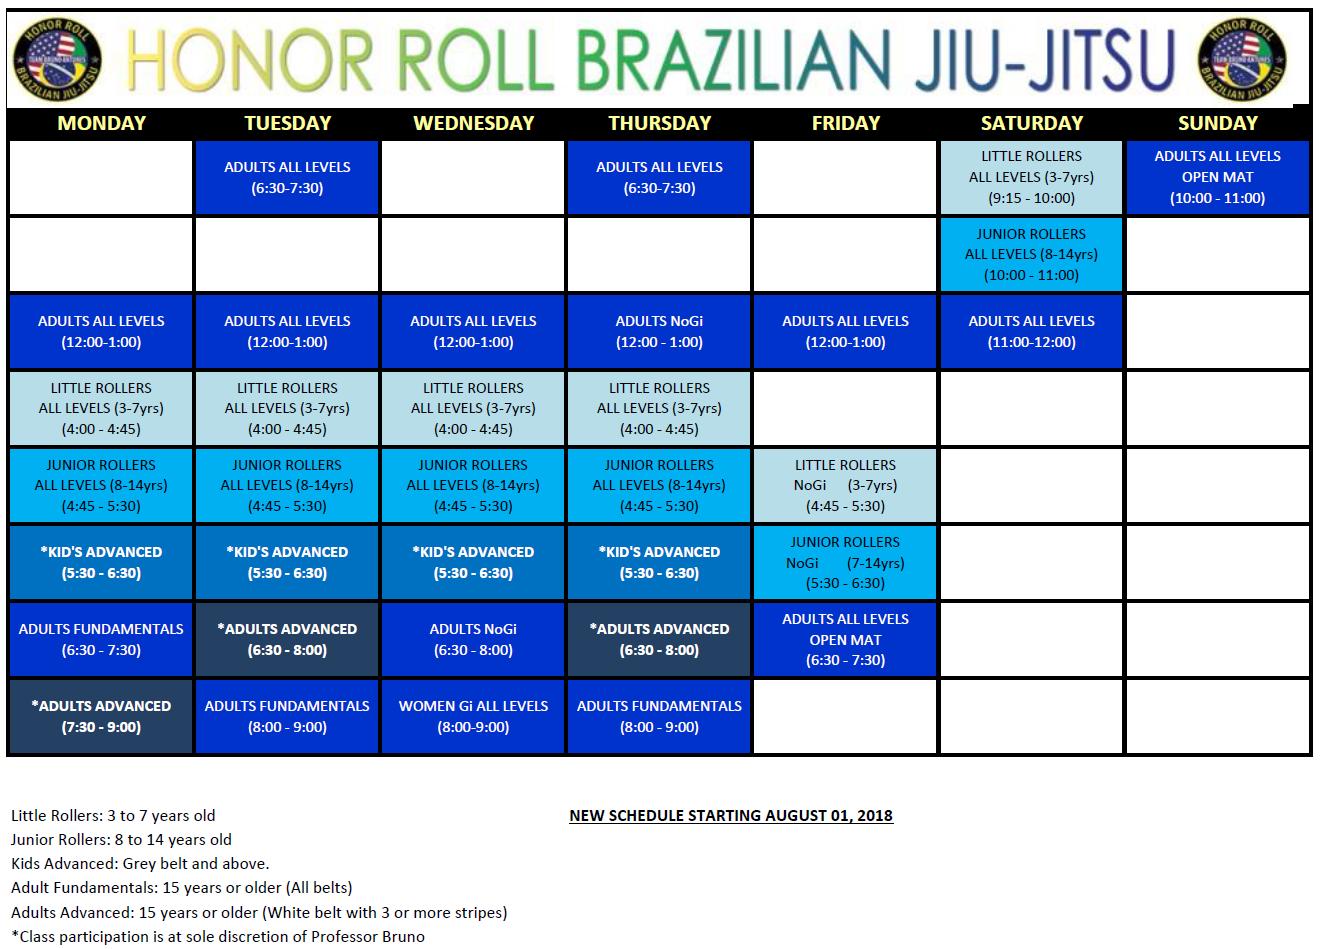 Brazilian Jiu-Jitsu  Schedule serving in Santa Clarita, Saugus, Valencia, Canyon Country, Castaic, and Newhall.